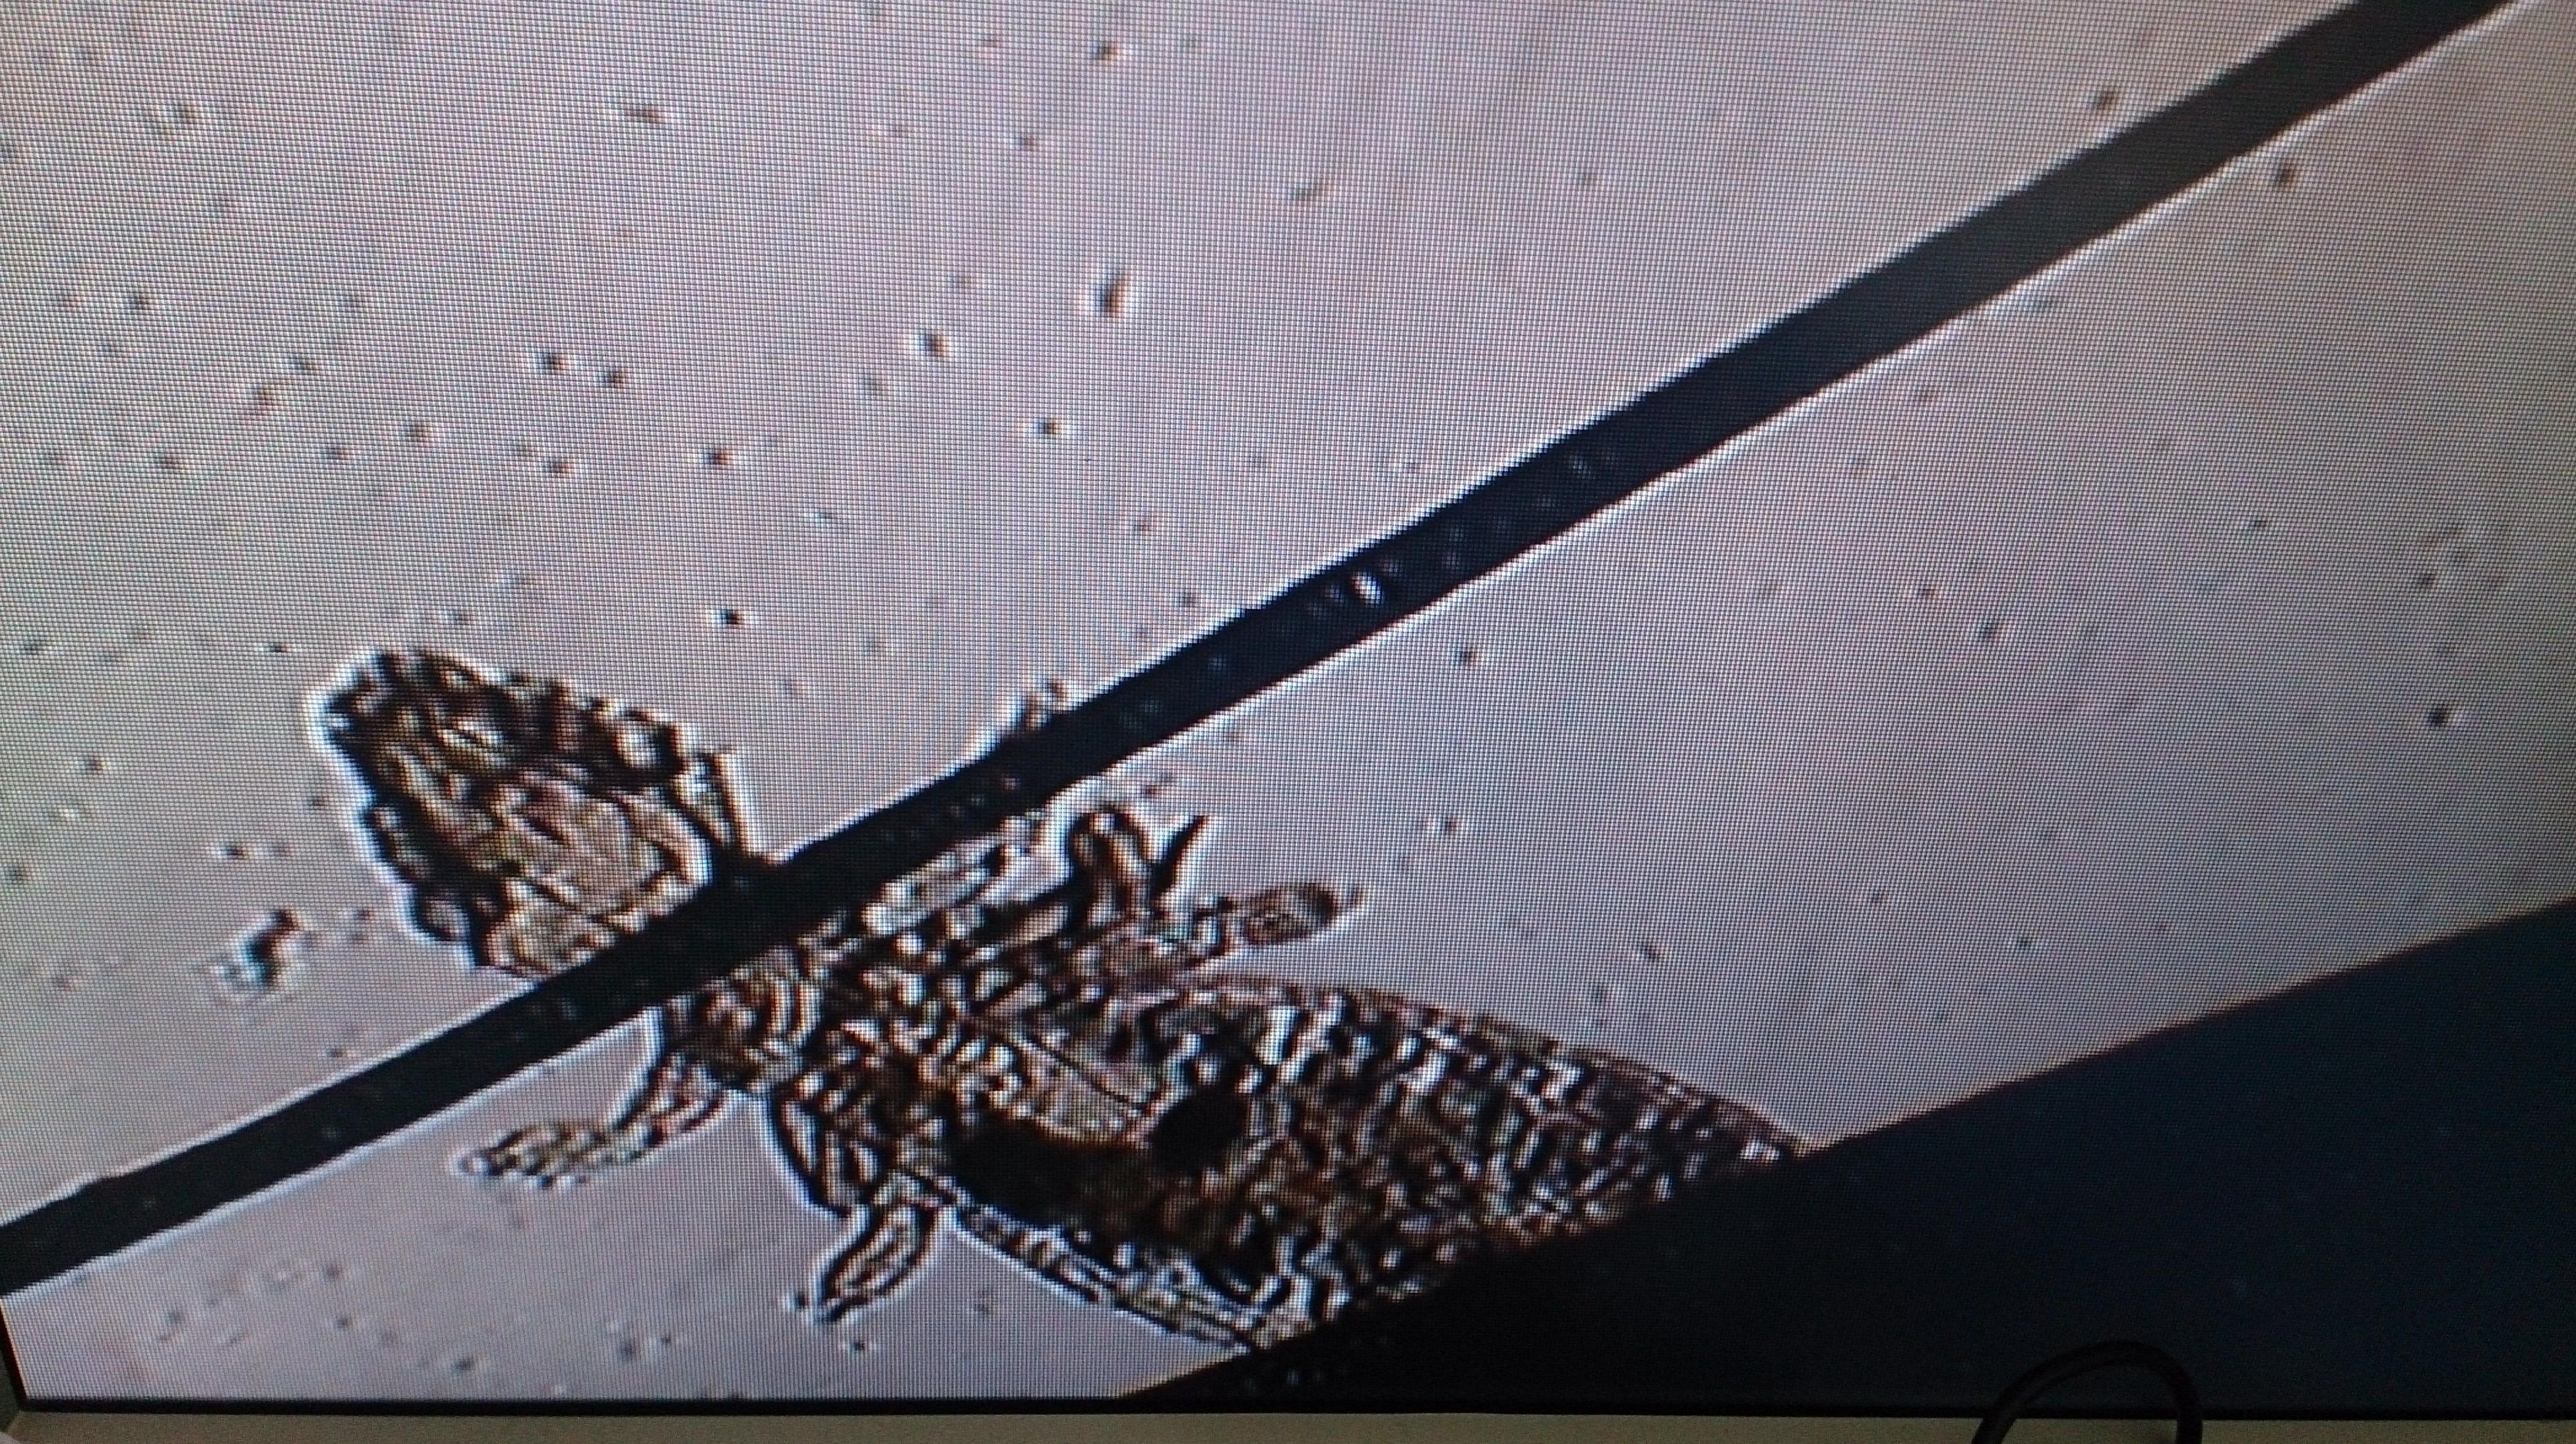 PIOJOS(GLIRICELA PORCELI) AL MICROSCOPIO EN COBAYA(CAVIA PORCELI)